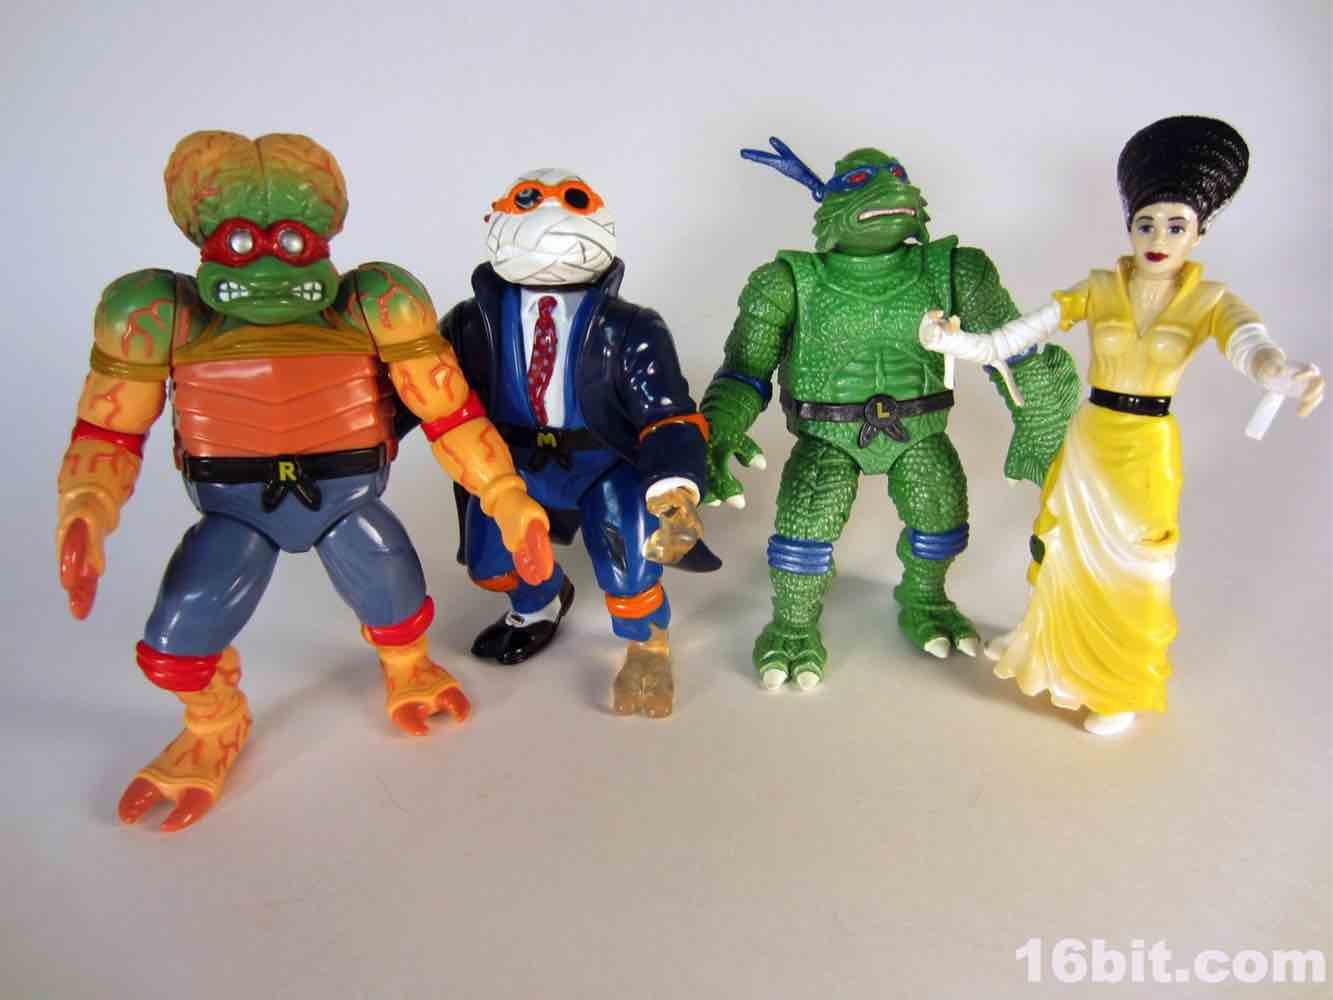 16bit.com Figure of the Day Review: Playmates Teenage Mutant Ninja ...